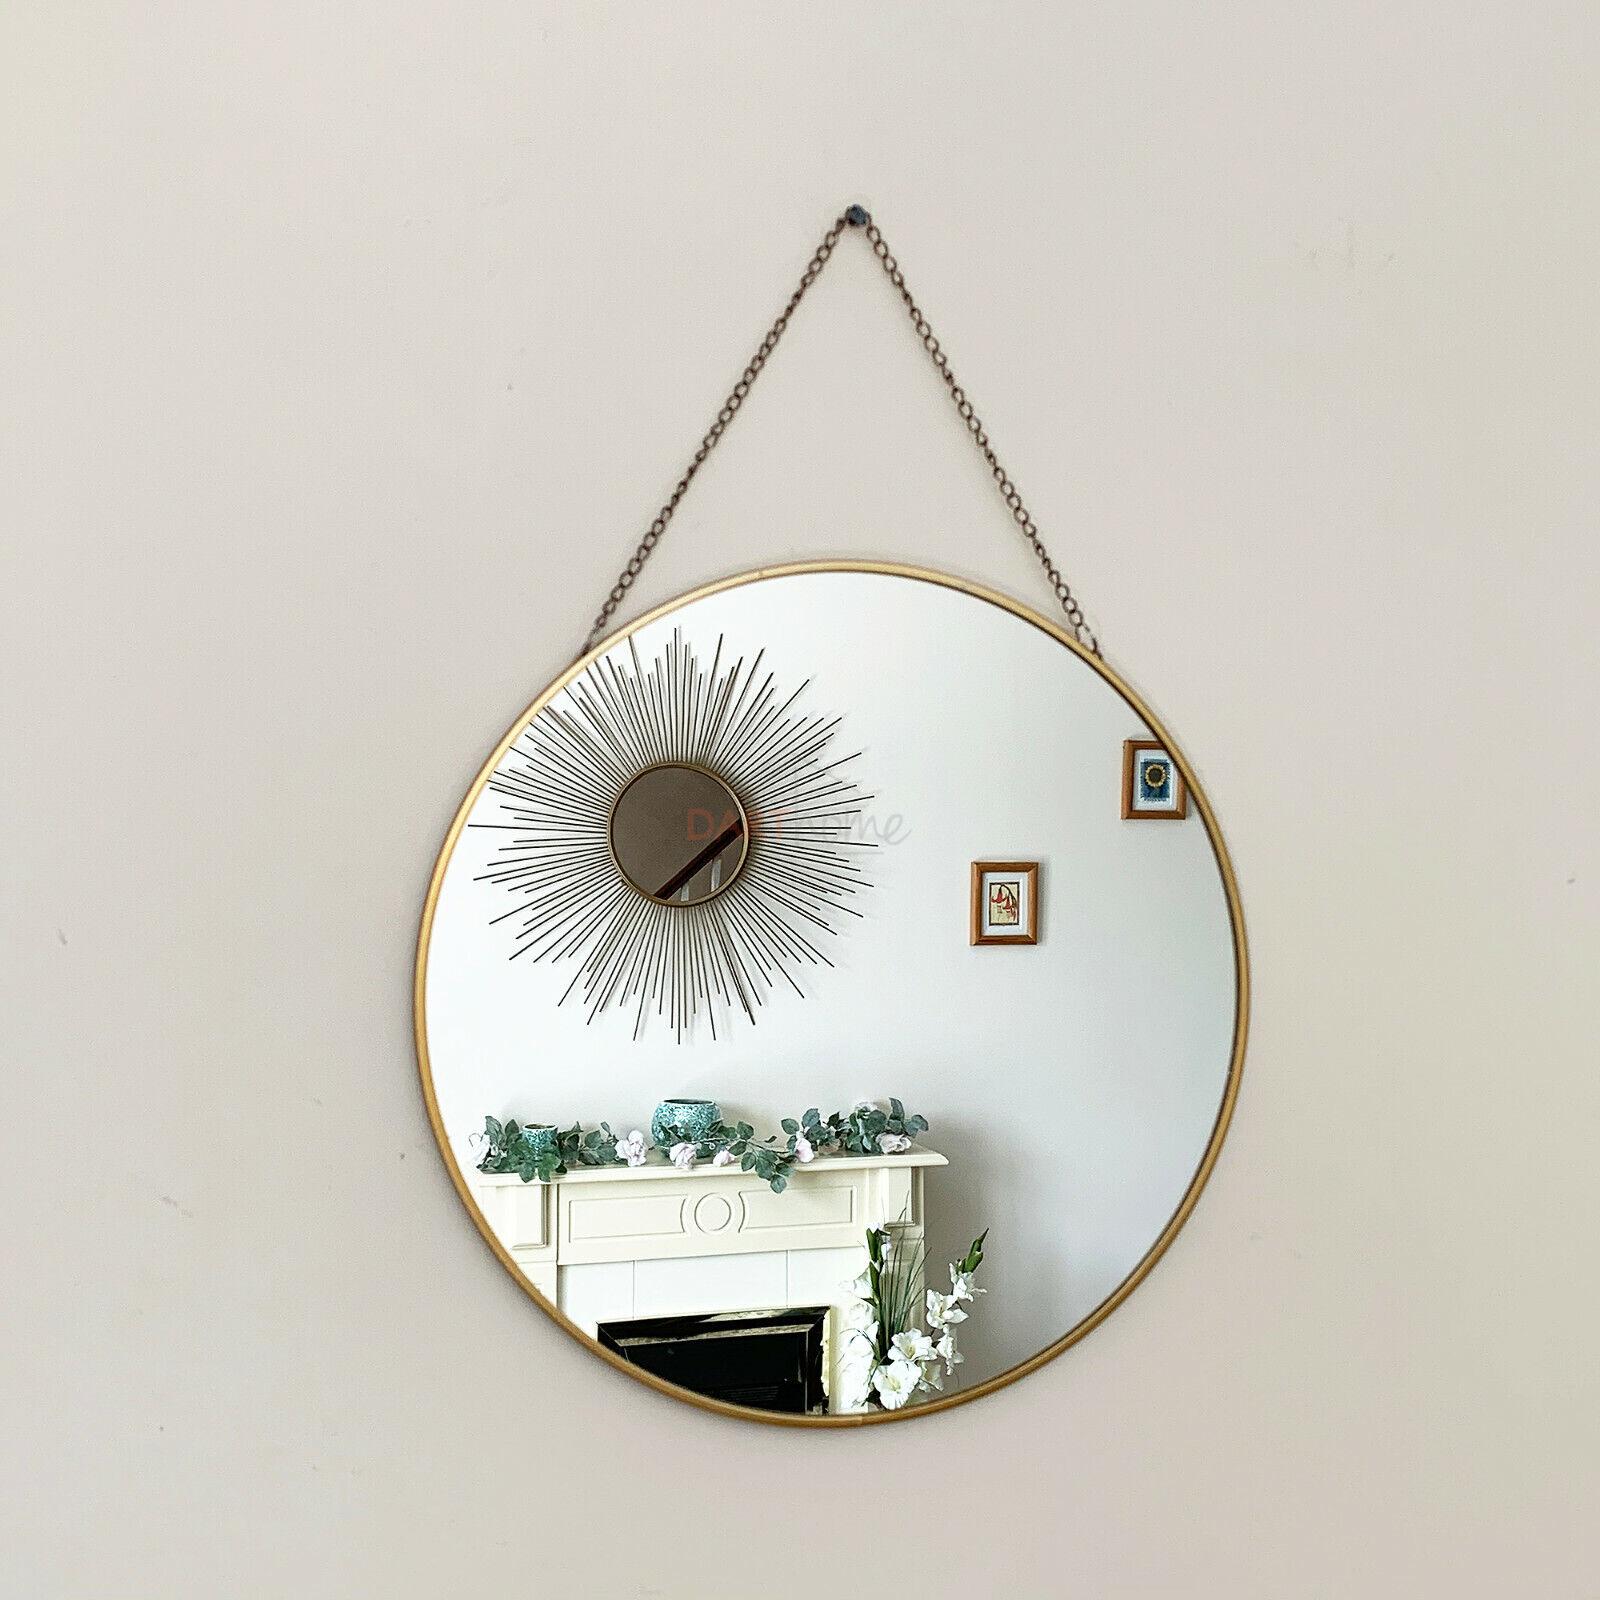 mirror - Vintage Round Chain Hanging Gold Frame Bathroom Shaving Glass Wall Decor Mirror